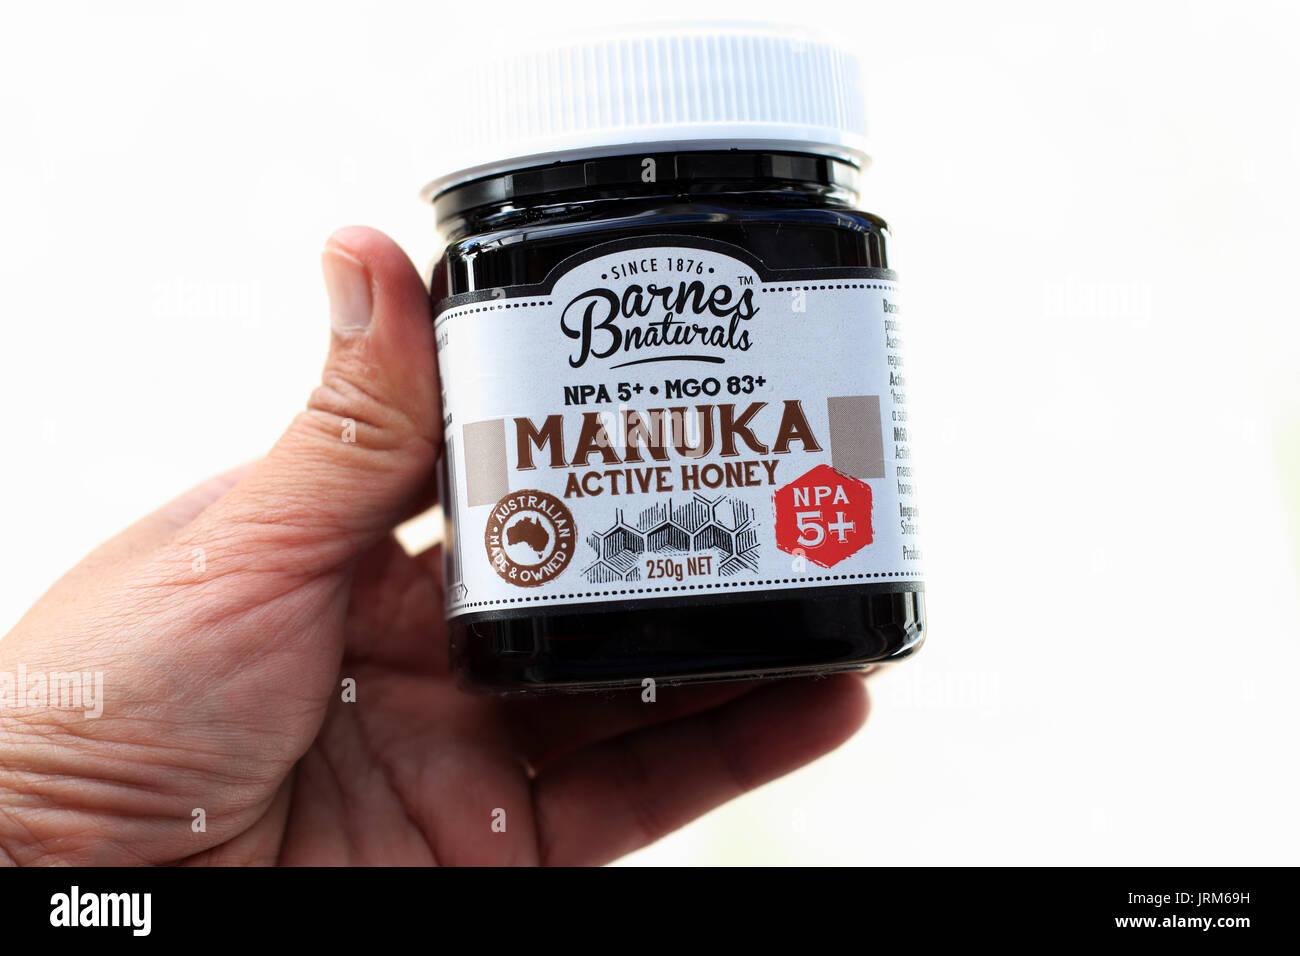 Barnes Naturals Australian Manuka Honey - Stock Image